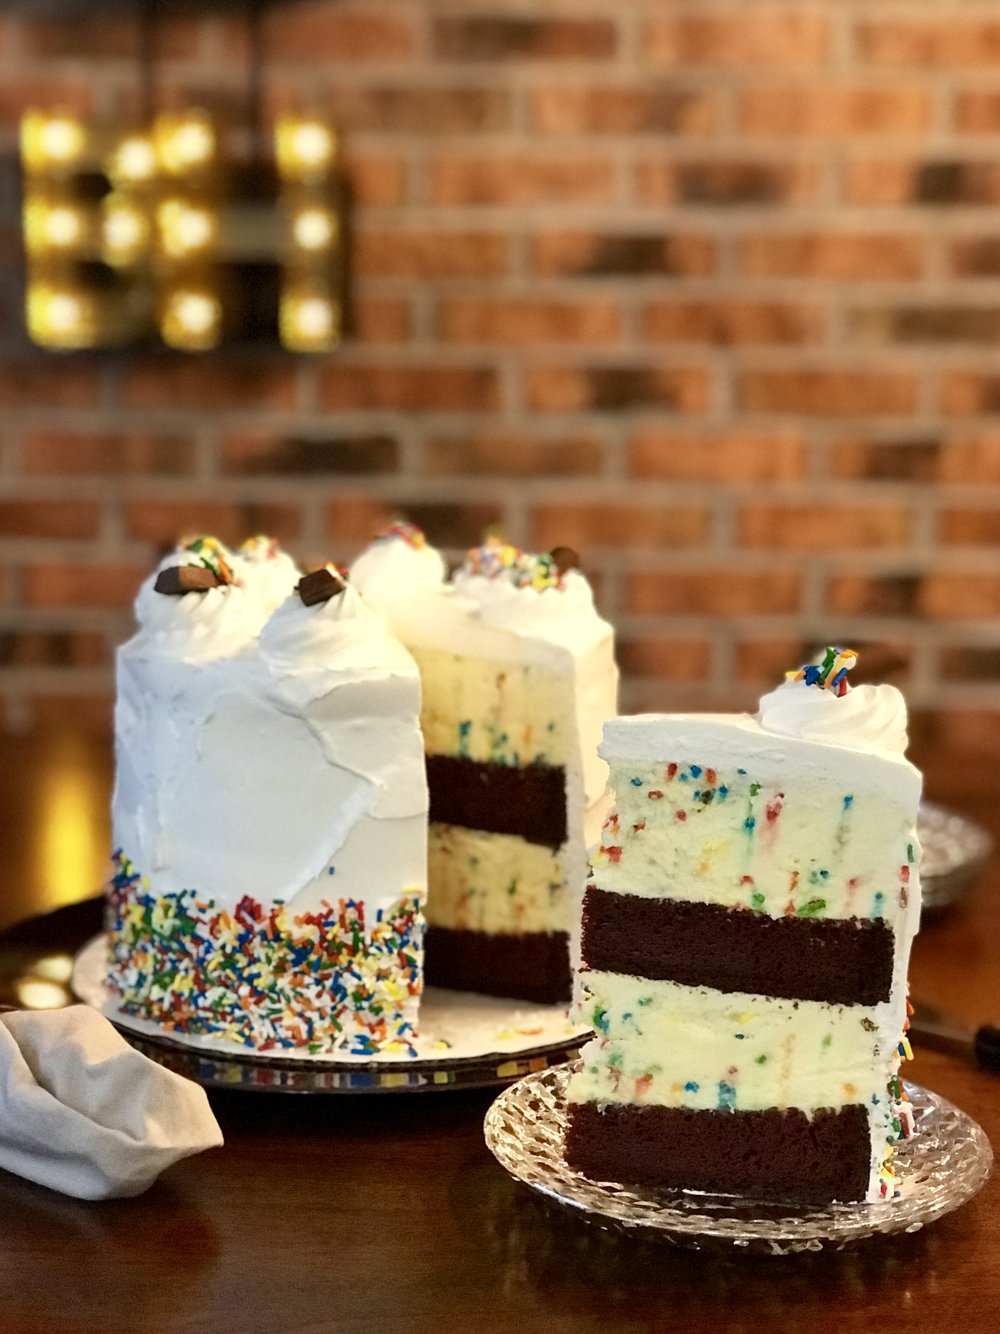 Birthday Ice Cream Cake The Bell House